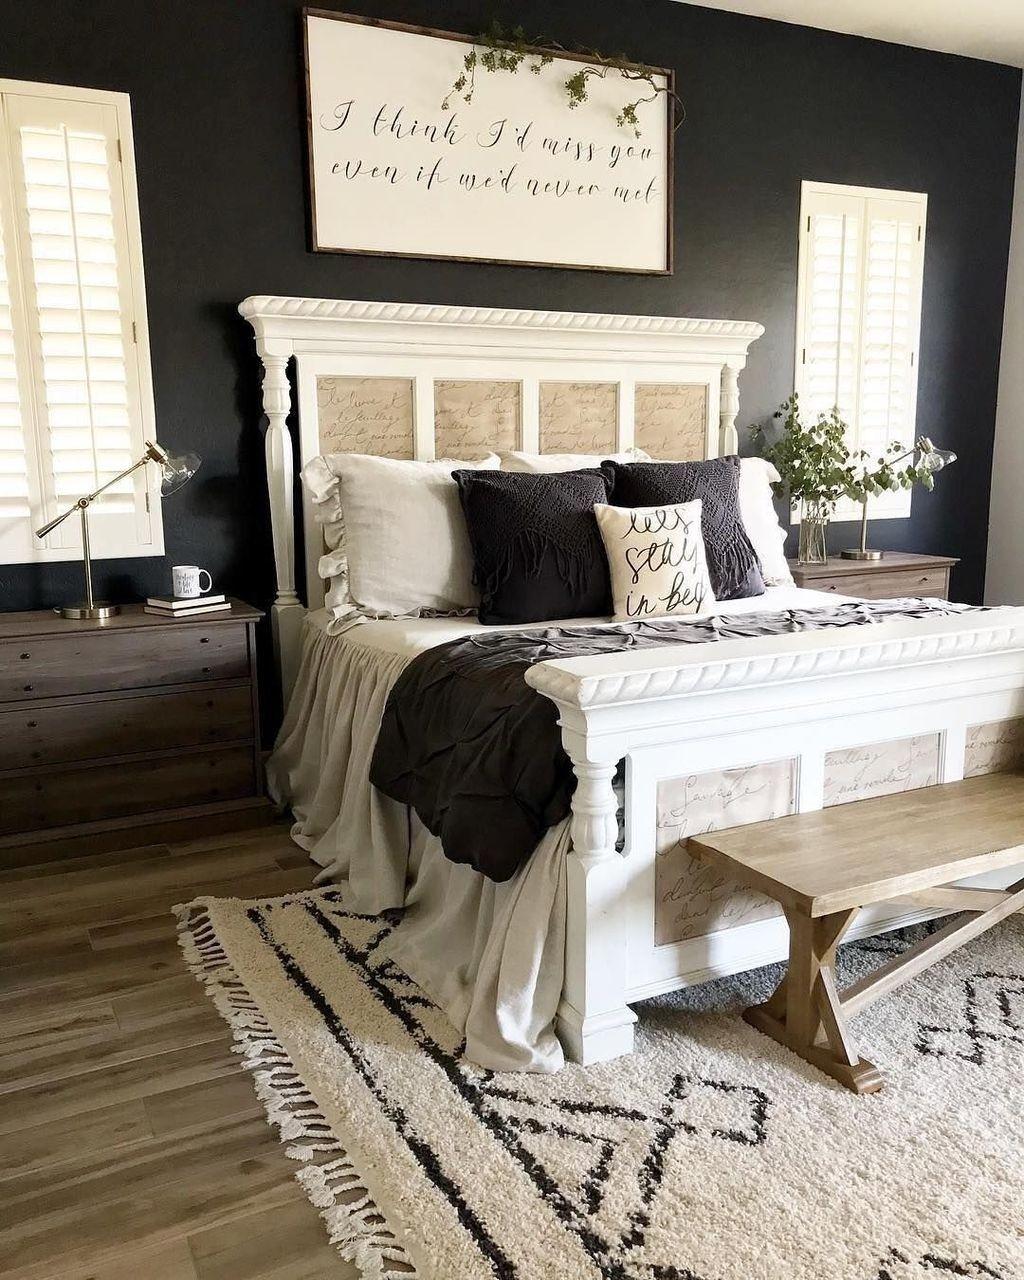 40 Awesome Emphasis Interior Design Ideas Emphasis Interiordesign Interiordesignideas Bedroom Color Schemes Master Bedroom Color Schemes Bedroom Decor